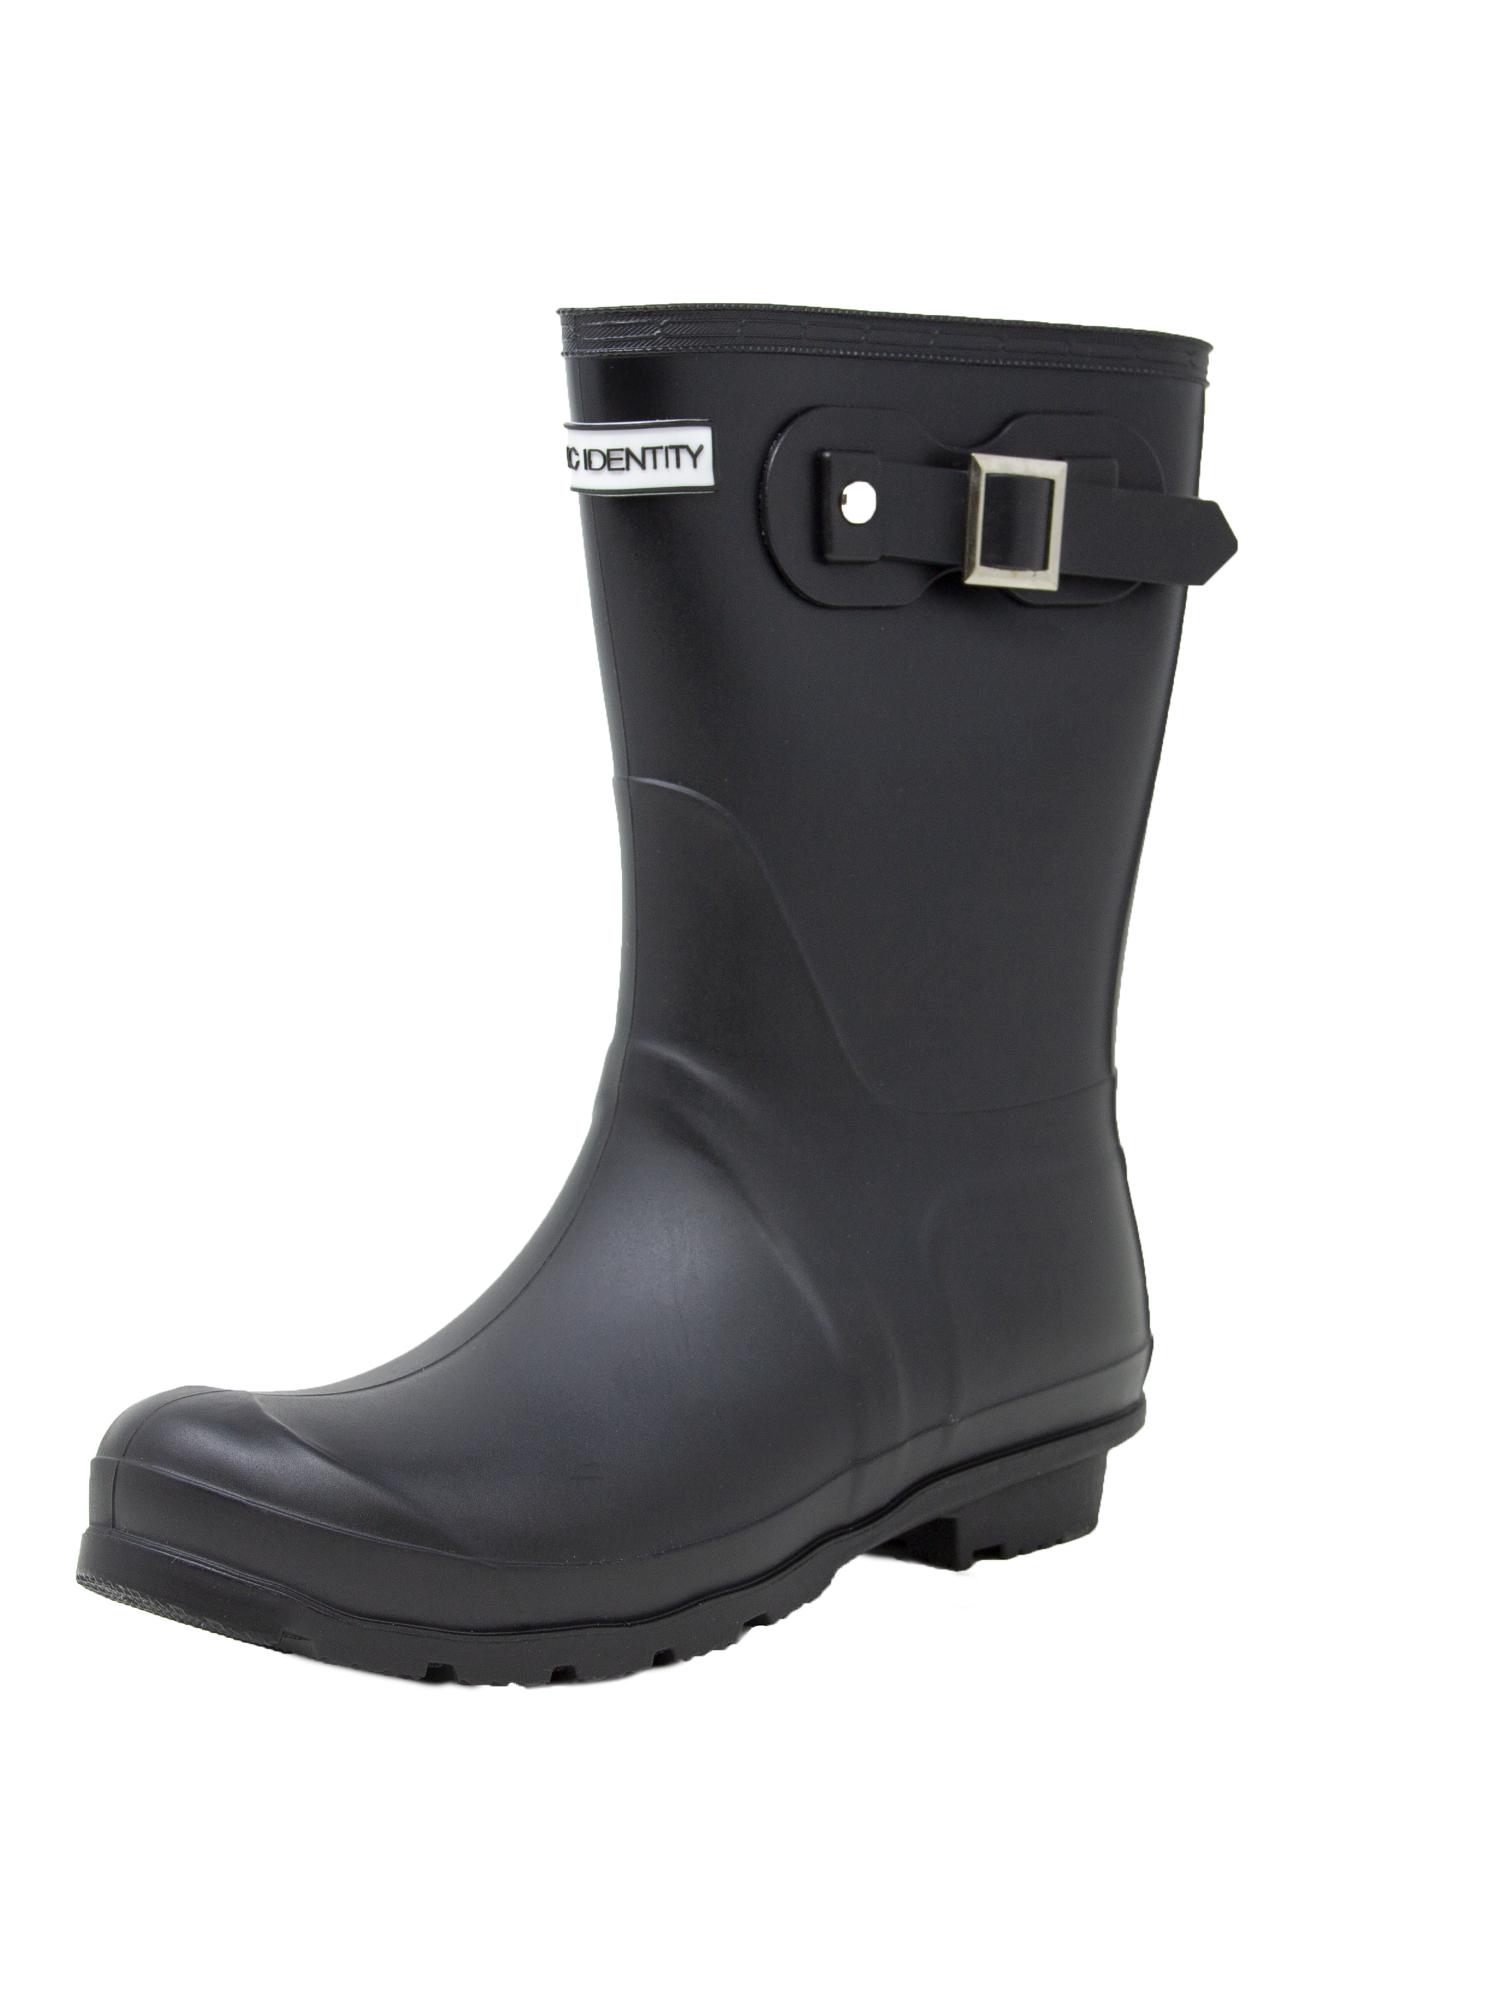 Exotic-Identity-Short-Rain-Boots-Non-Slip-100-Waterproof-for-Women thumbnail 7